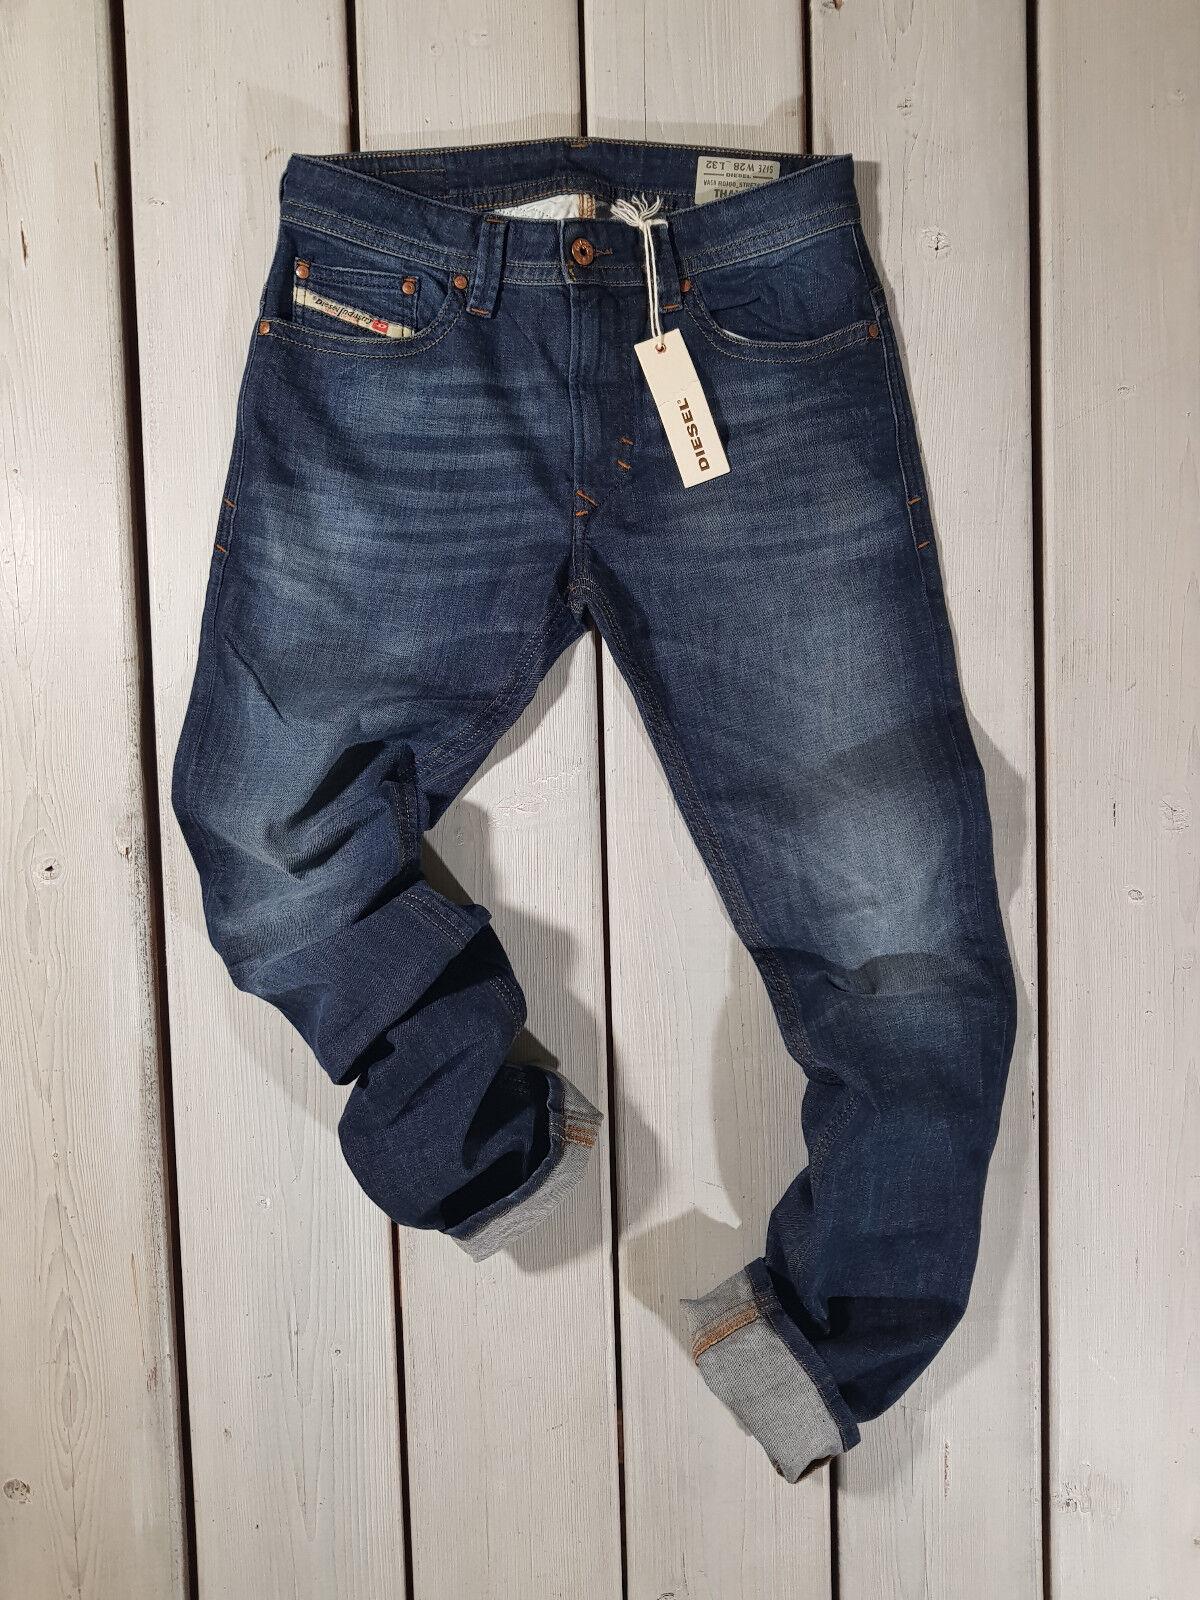 DIESEL THAVAR RV418 Mens Denim Jeans Stretch Slim Fit Skinny